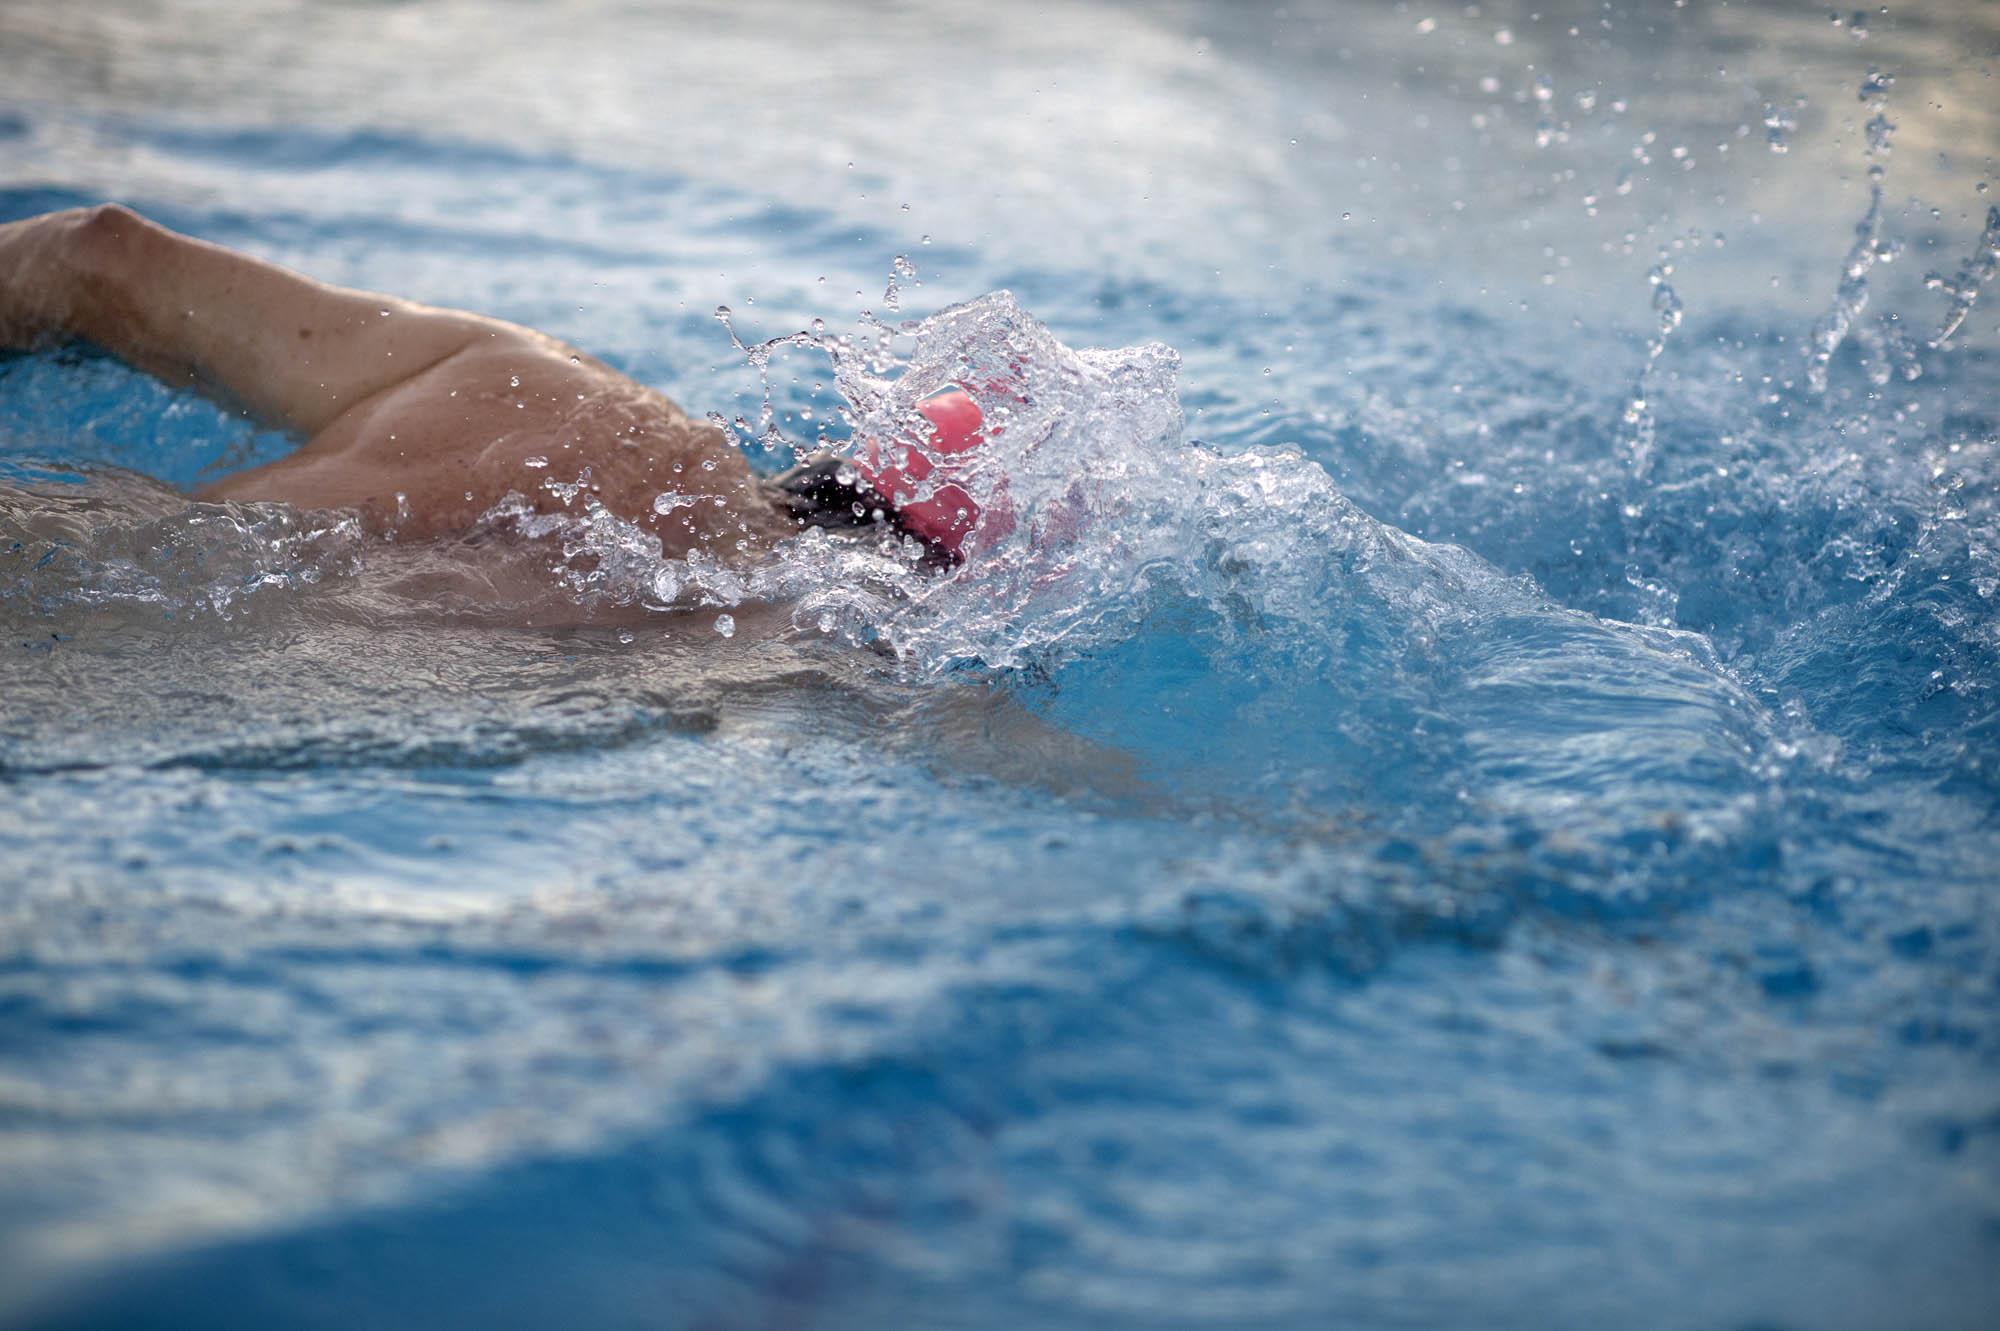 Sport ad abano e montegrotto terme thermae abano montegrotto - Montegrotto piscine termali ...